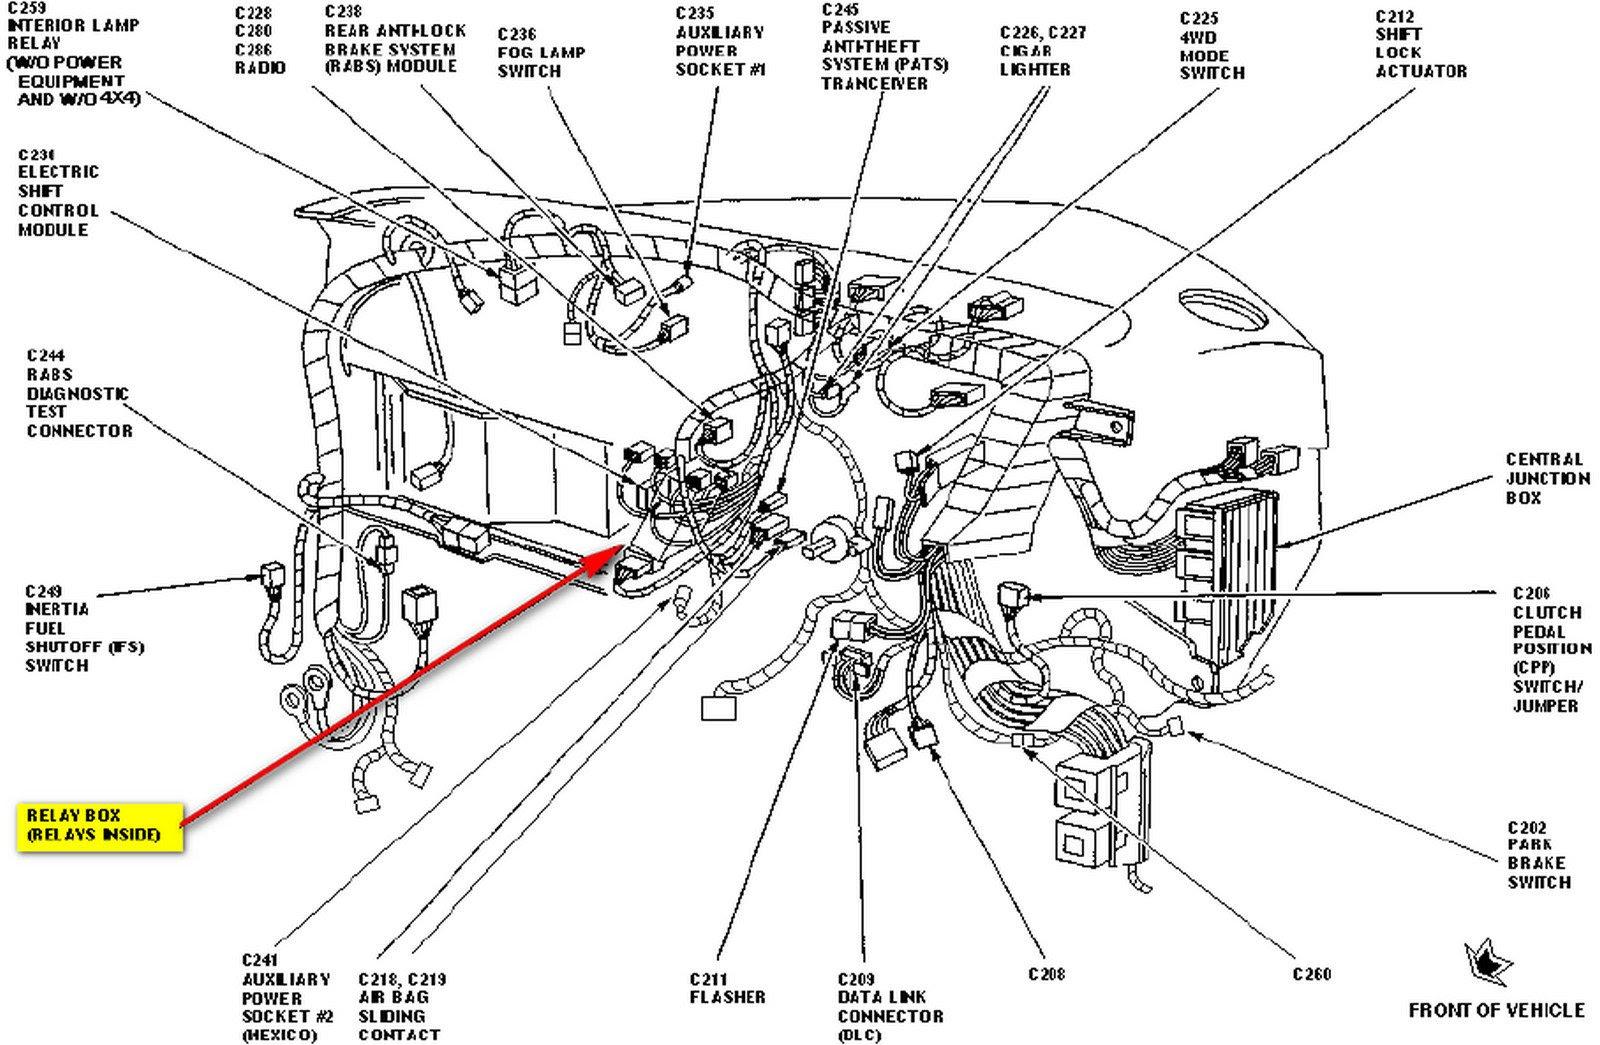 [DIAGRAM] Wiring Diagram De Ford Ranger 1997 FULL Version